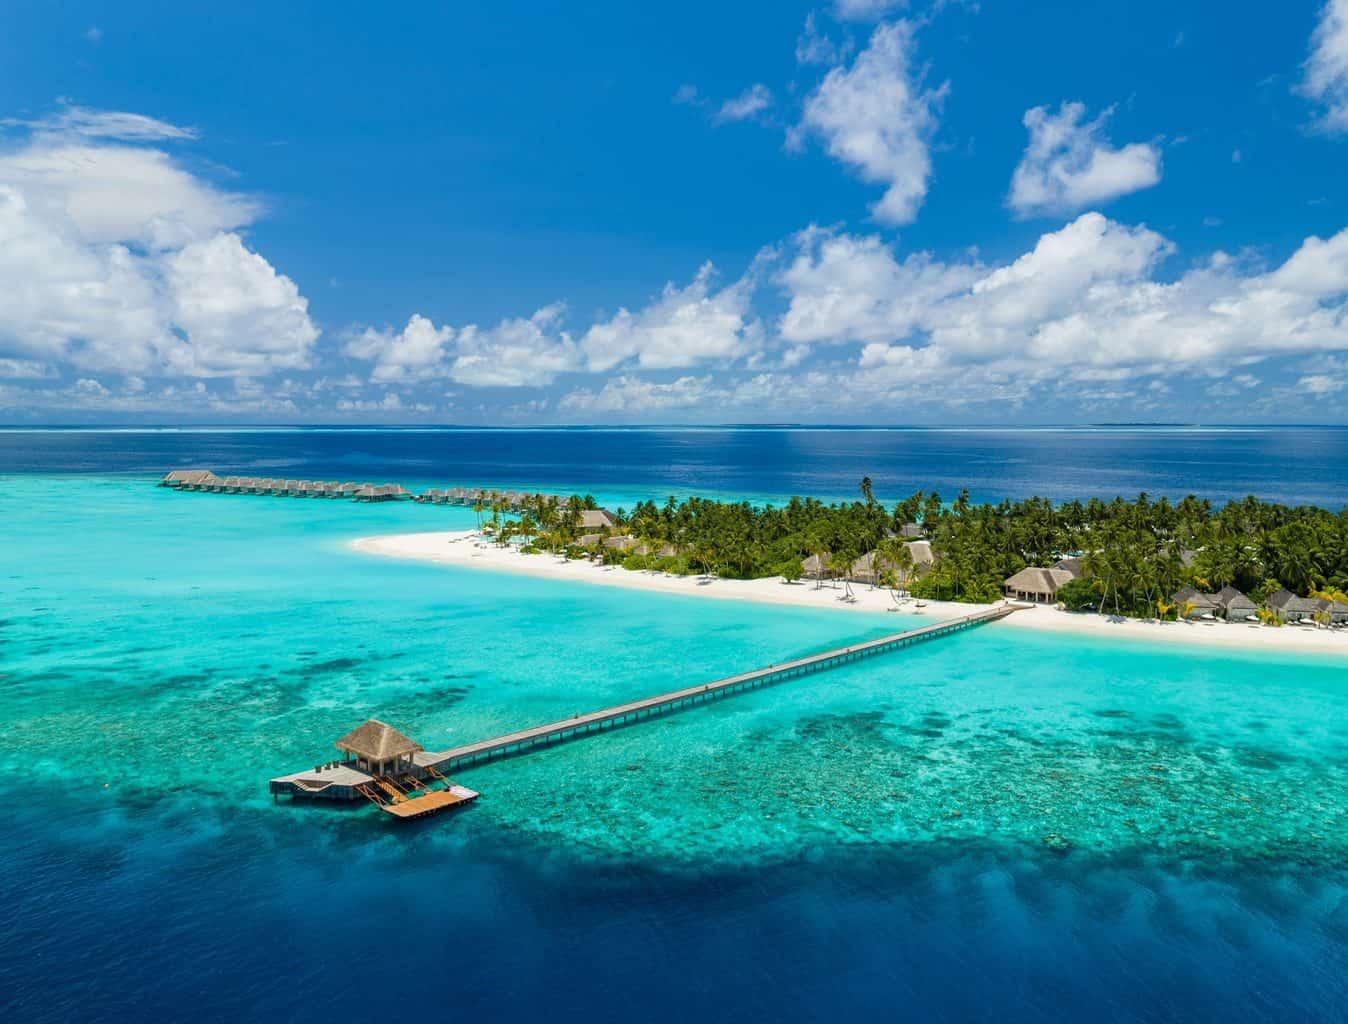 Hoteis-para-Lua-de-Mel-nas-Maldivas-Baglioni-Maldives-1-scaled